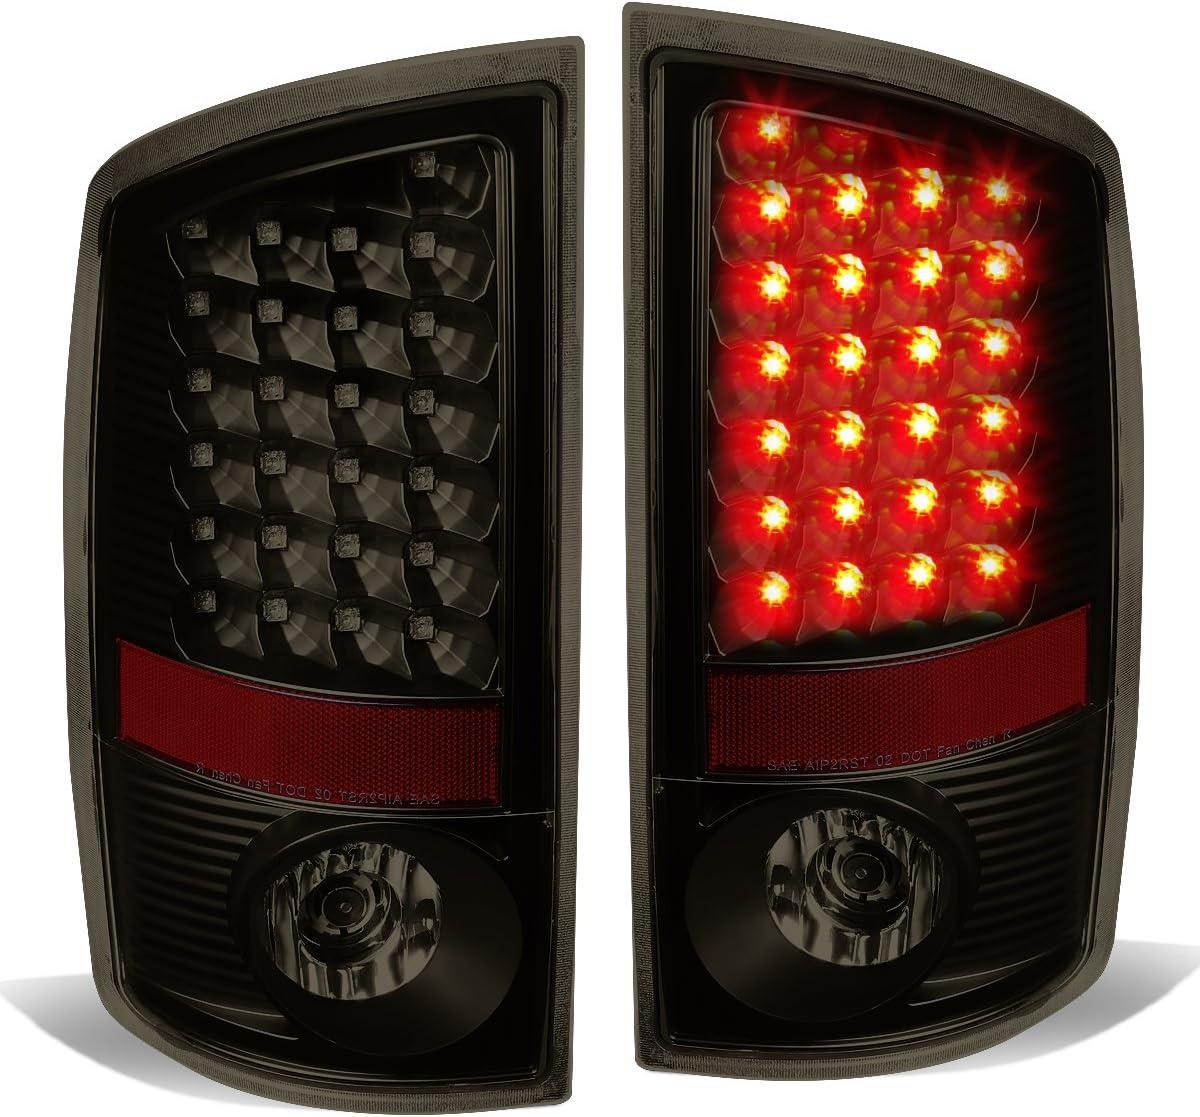 3D LED C-Bar Fit 2007-2009 Dodge Ram Pickup Chrome Red Tail Light Brake Lamp